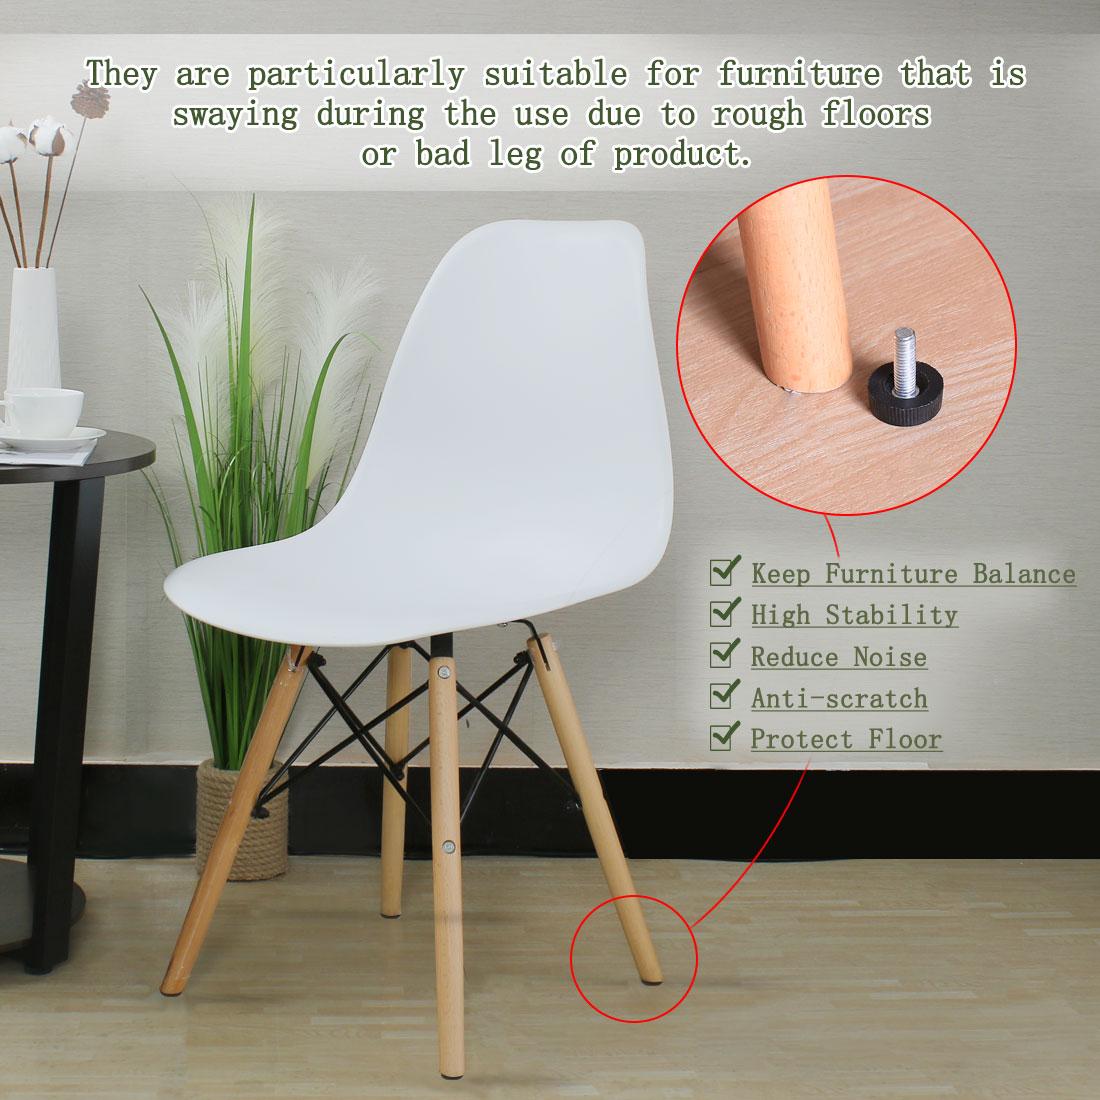 M6 x 18 x 20mm Leveling Feet Furniture Adjustable Leveler for Table Leg 2pcs - image 3 of 7